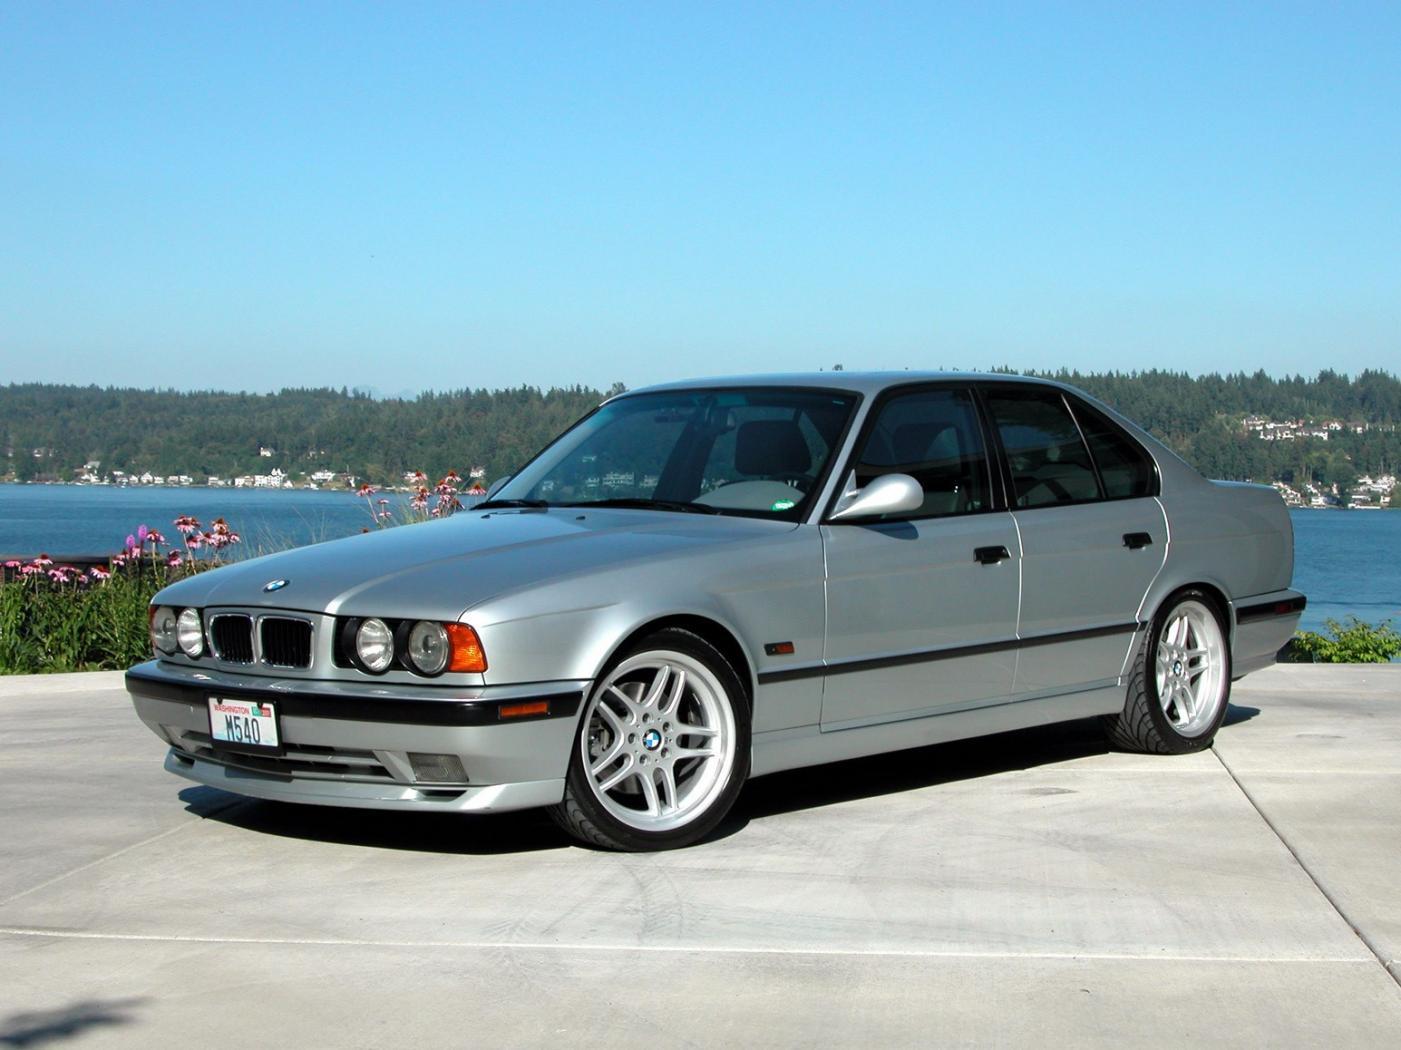 BMW-M5-E34_20170705-2301.jpeg